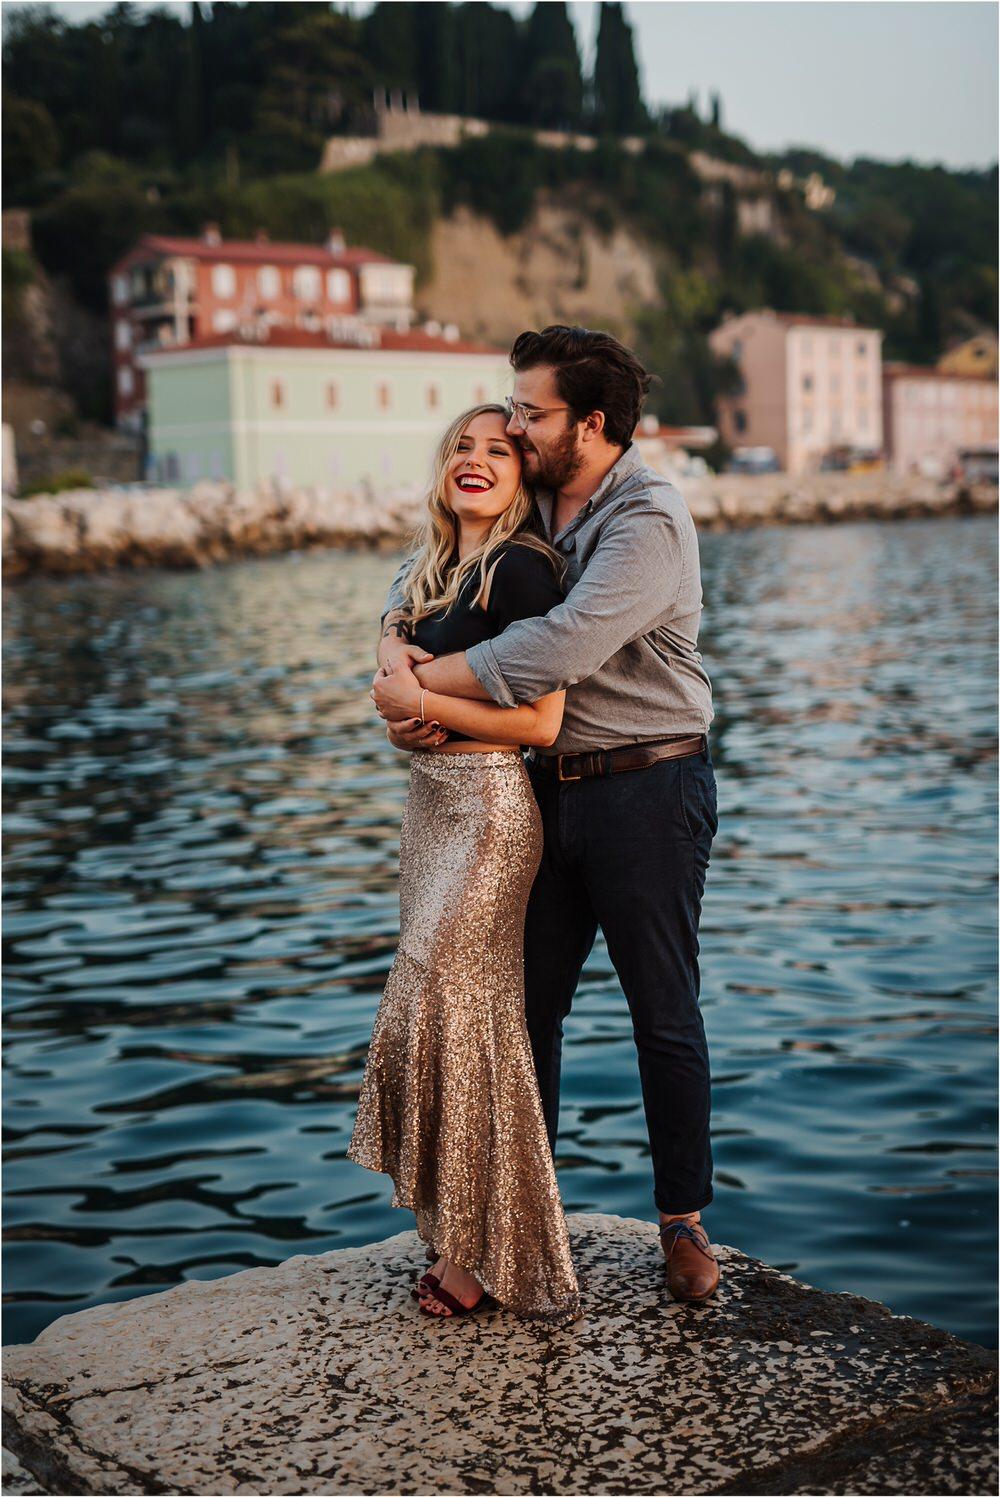 piran wedding photographer engagement anniversary honeymoon photography recommended slovenia seaside photographer  0060.jpg